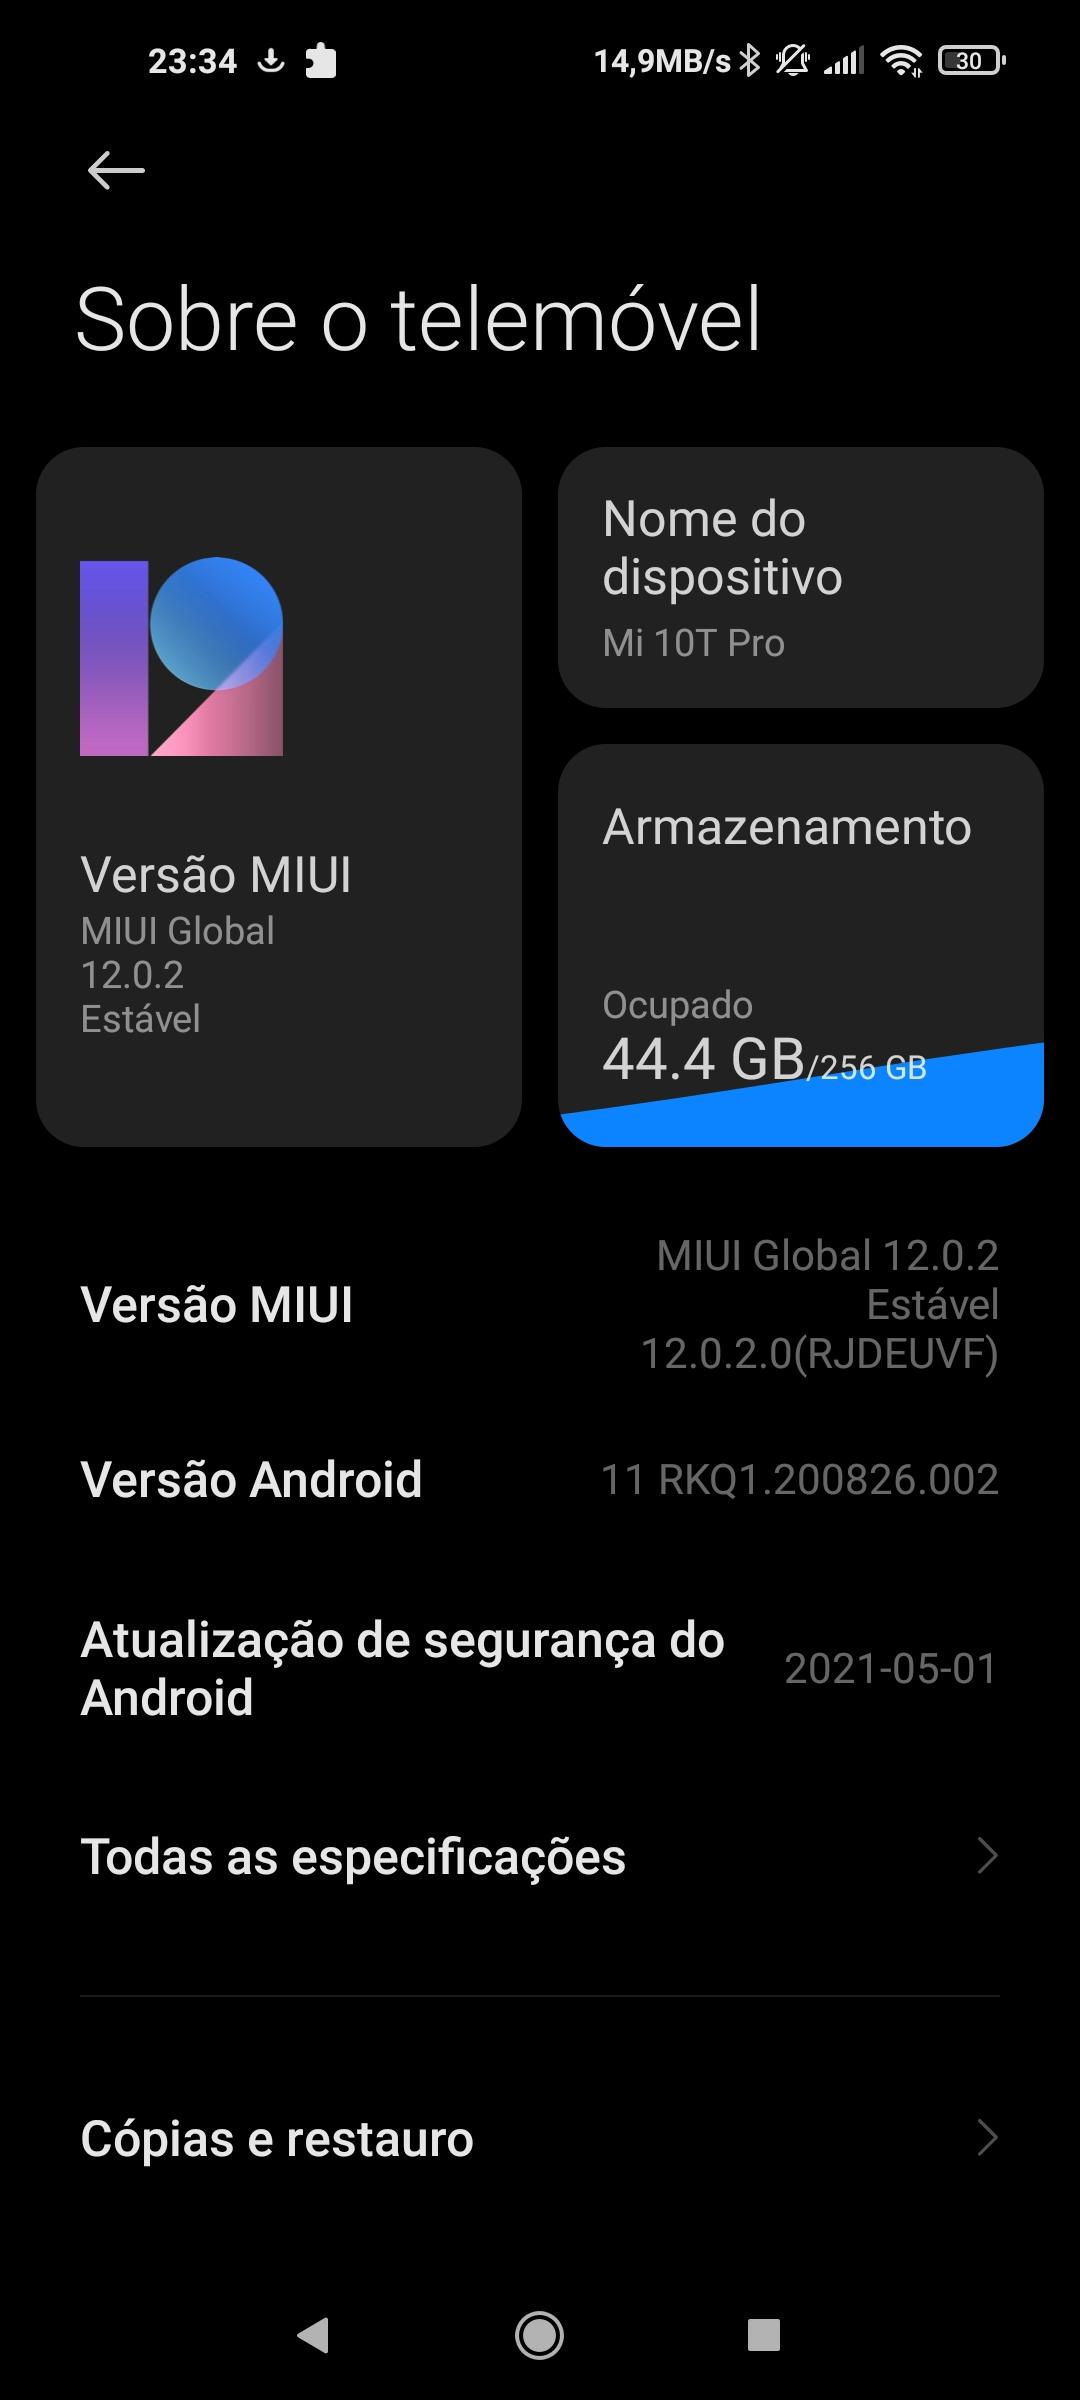 Screenshot_2021-06-11-23-34-39-392_com.android.settings.jpg